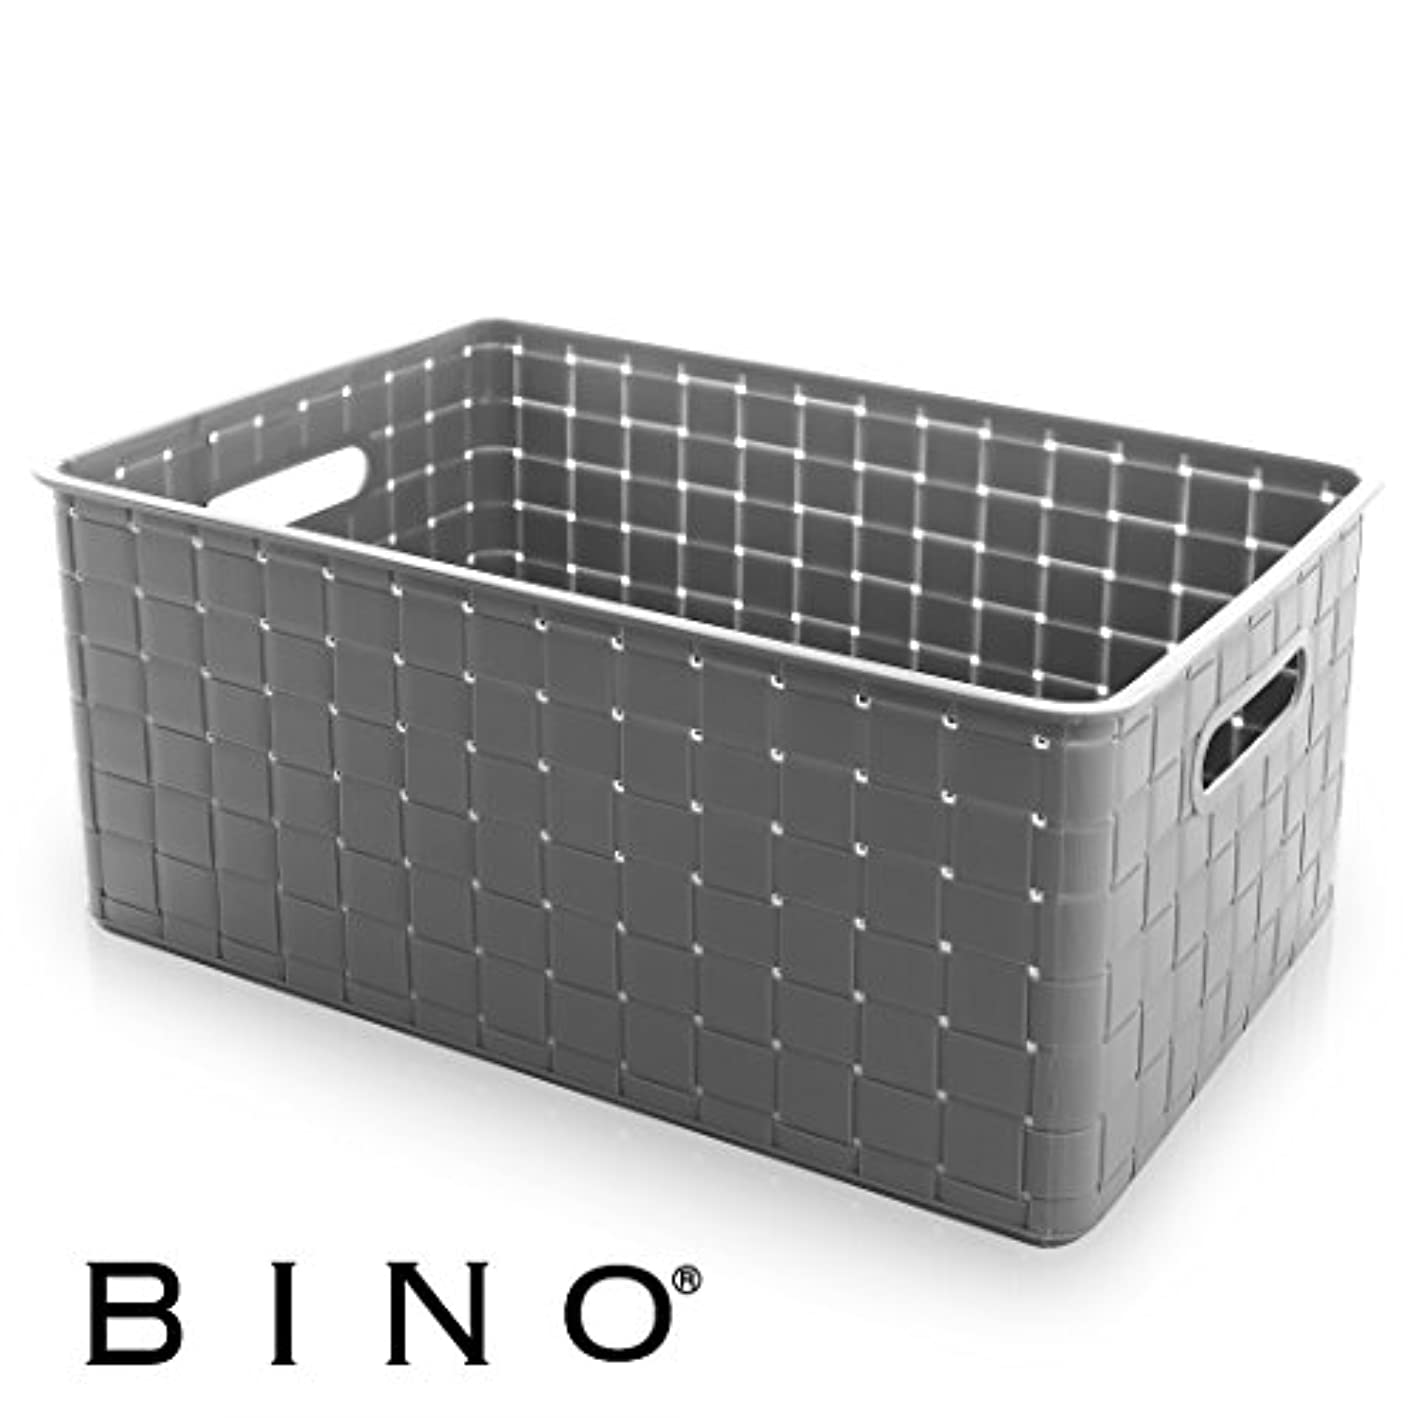 BINO Woven Plastic Storage Basket, Large (Grey)